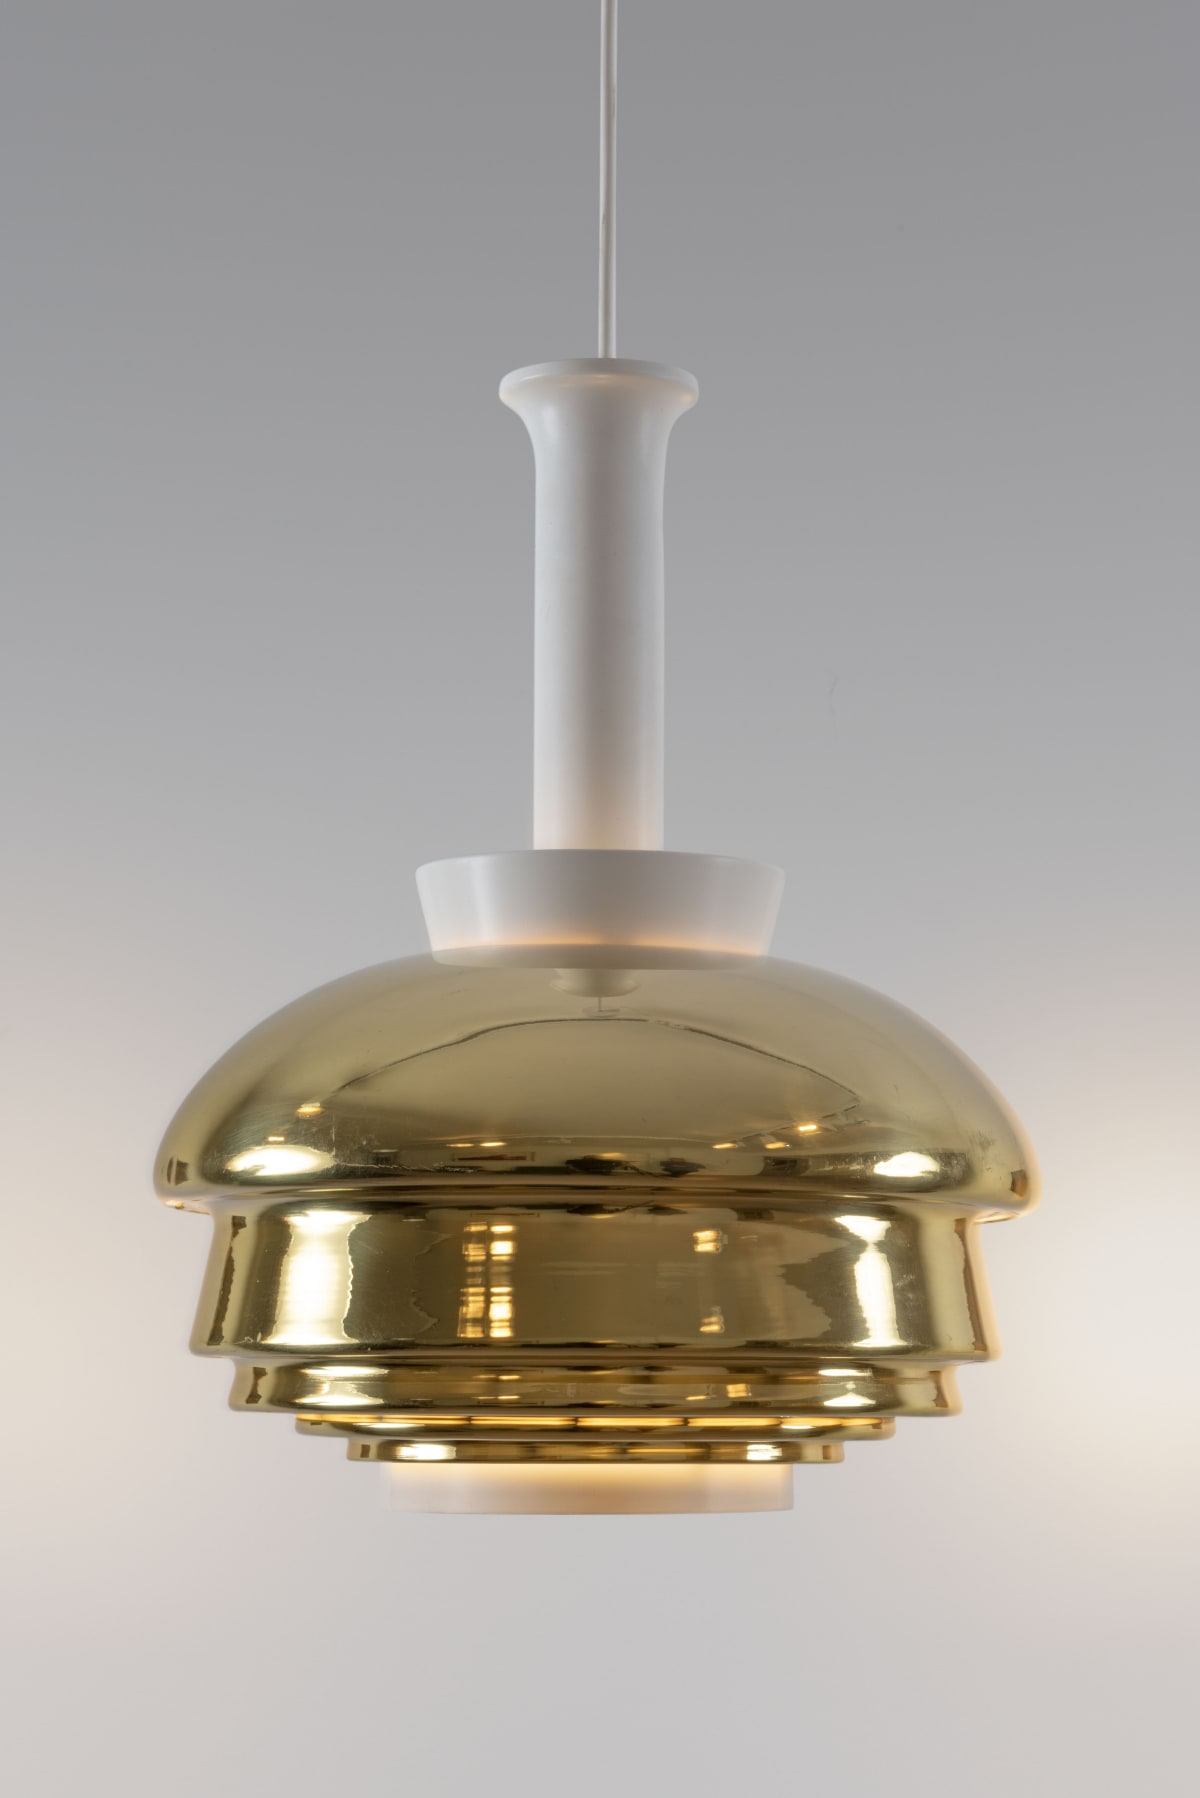 Alvar Aalto, Set of 3 pendant lights, 1950